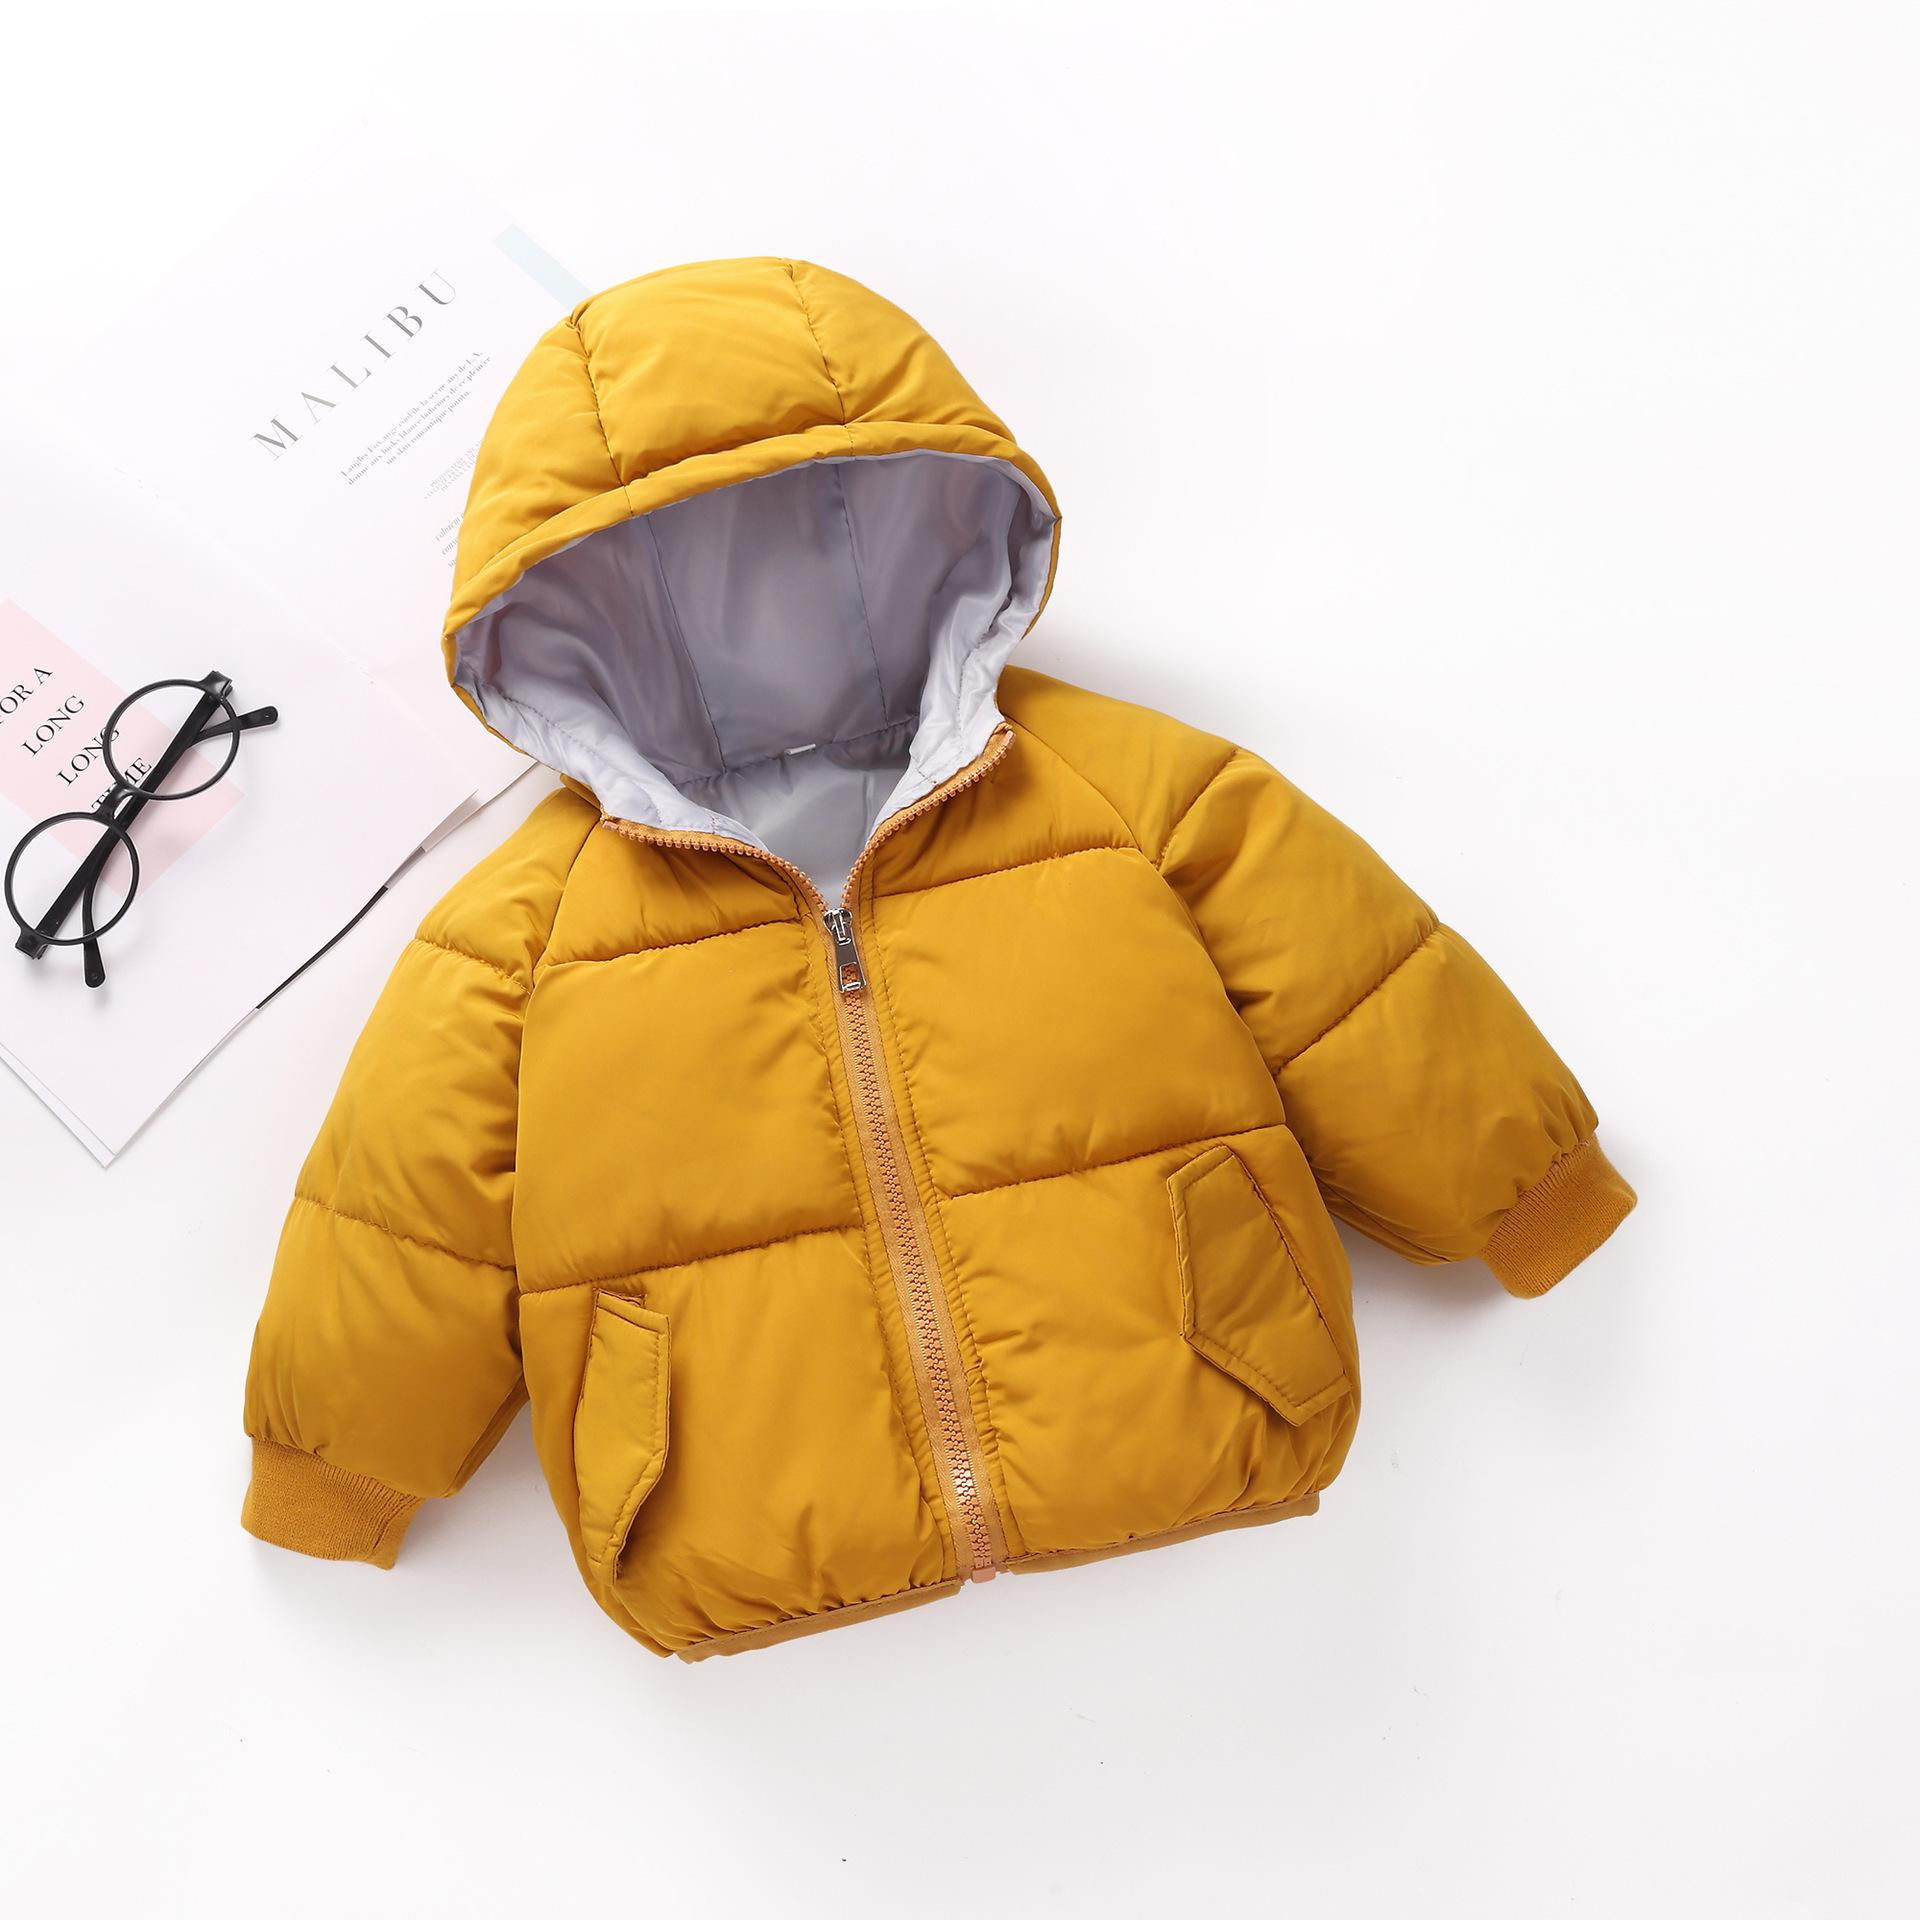 09eea4fa6 Good Quality Boys Winter Jackets 2019 Cotton Hooded Sports Coats ...